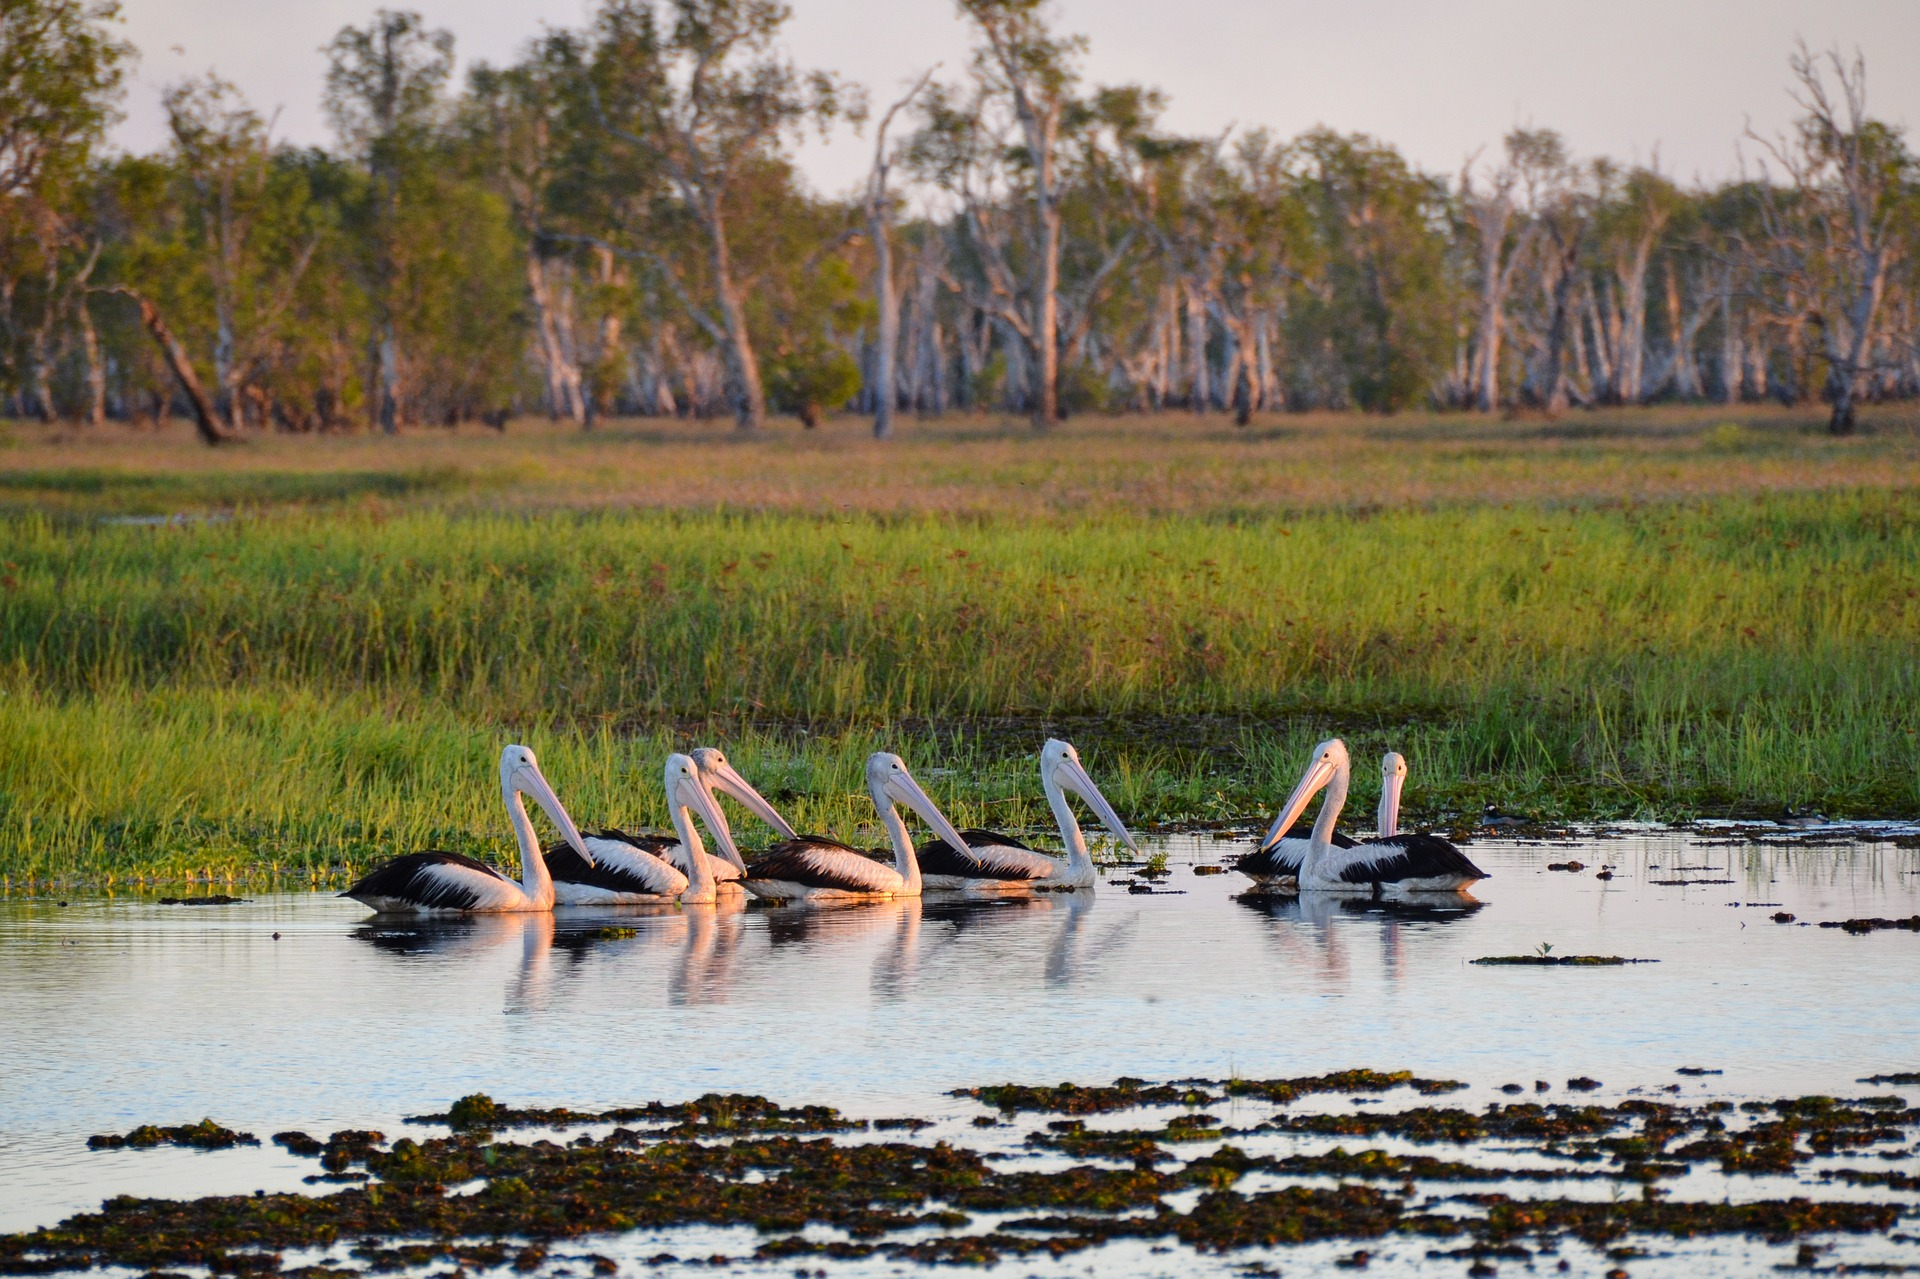 Pelicans resting in Kakadu National Park, Australia